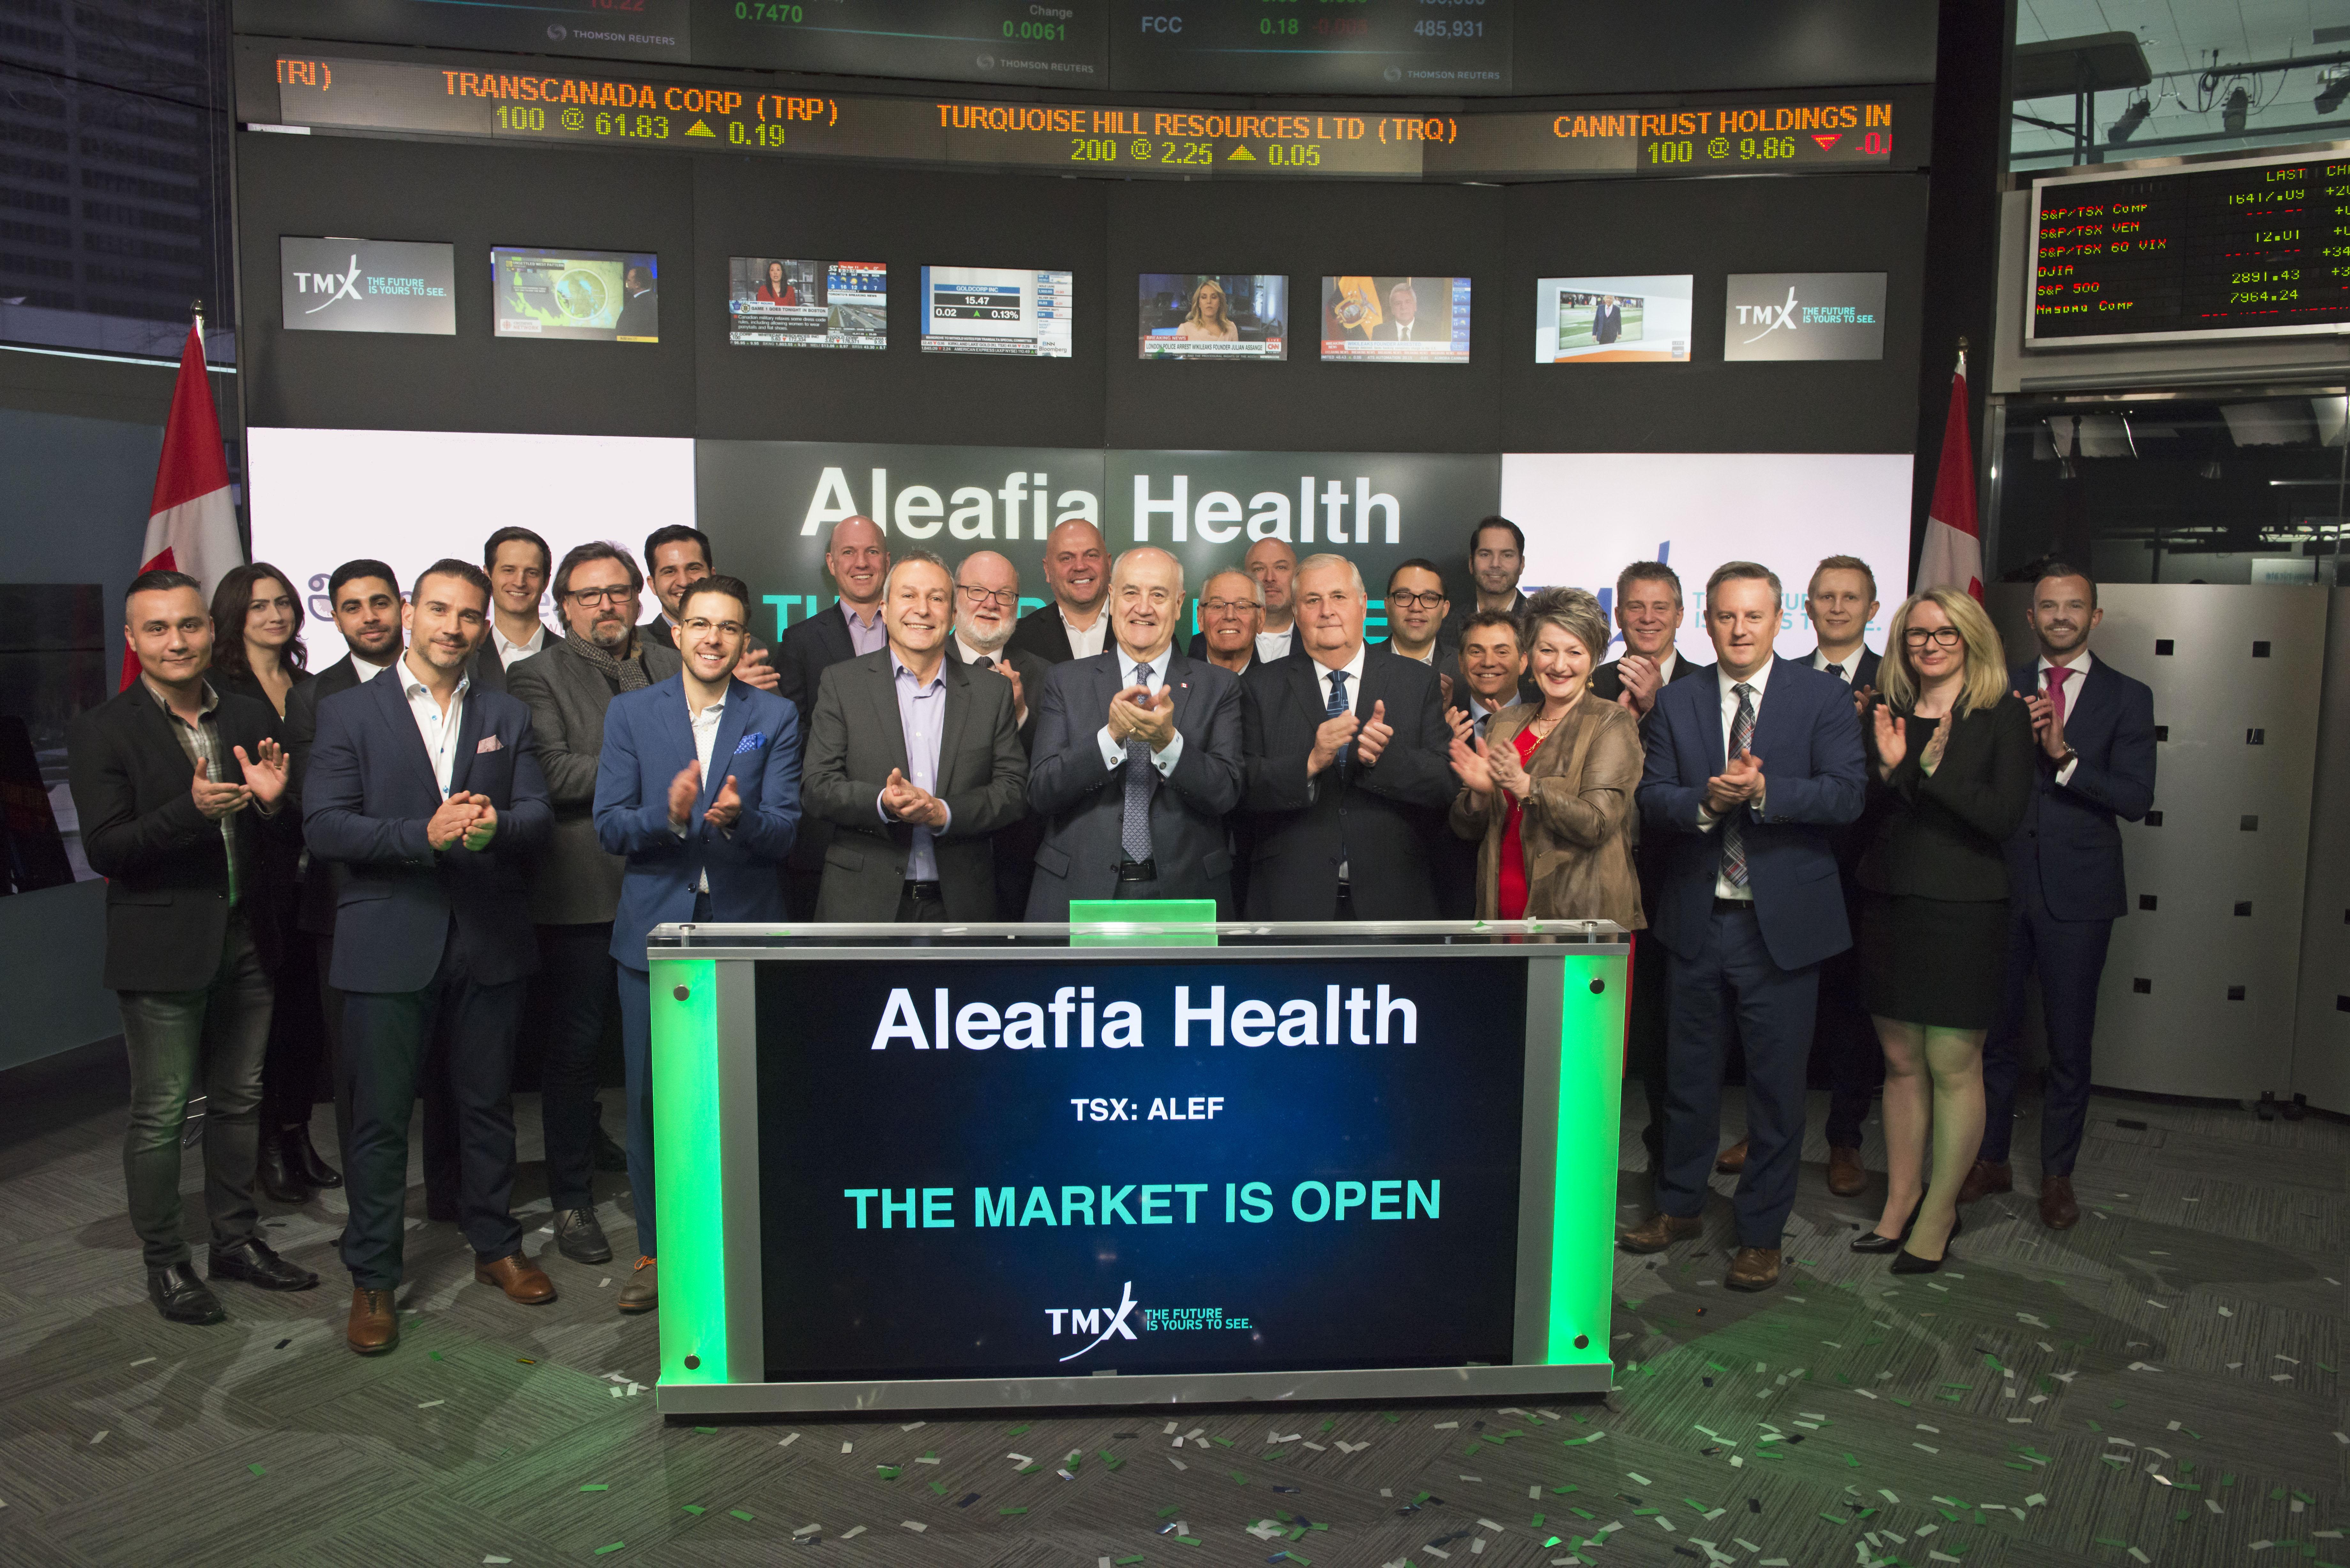 Aleafia Health Opens the Market